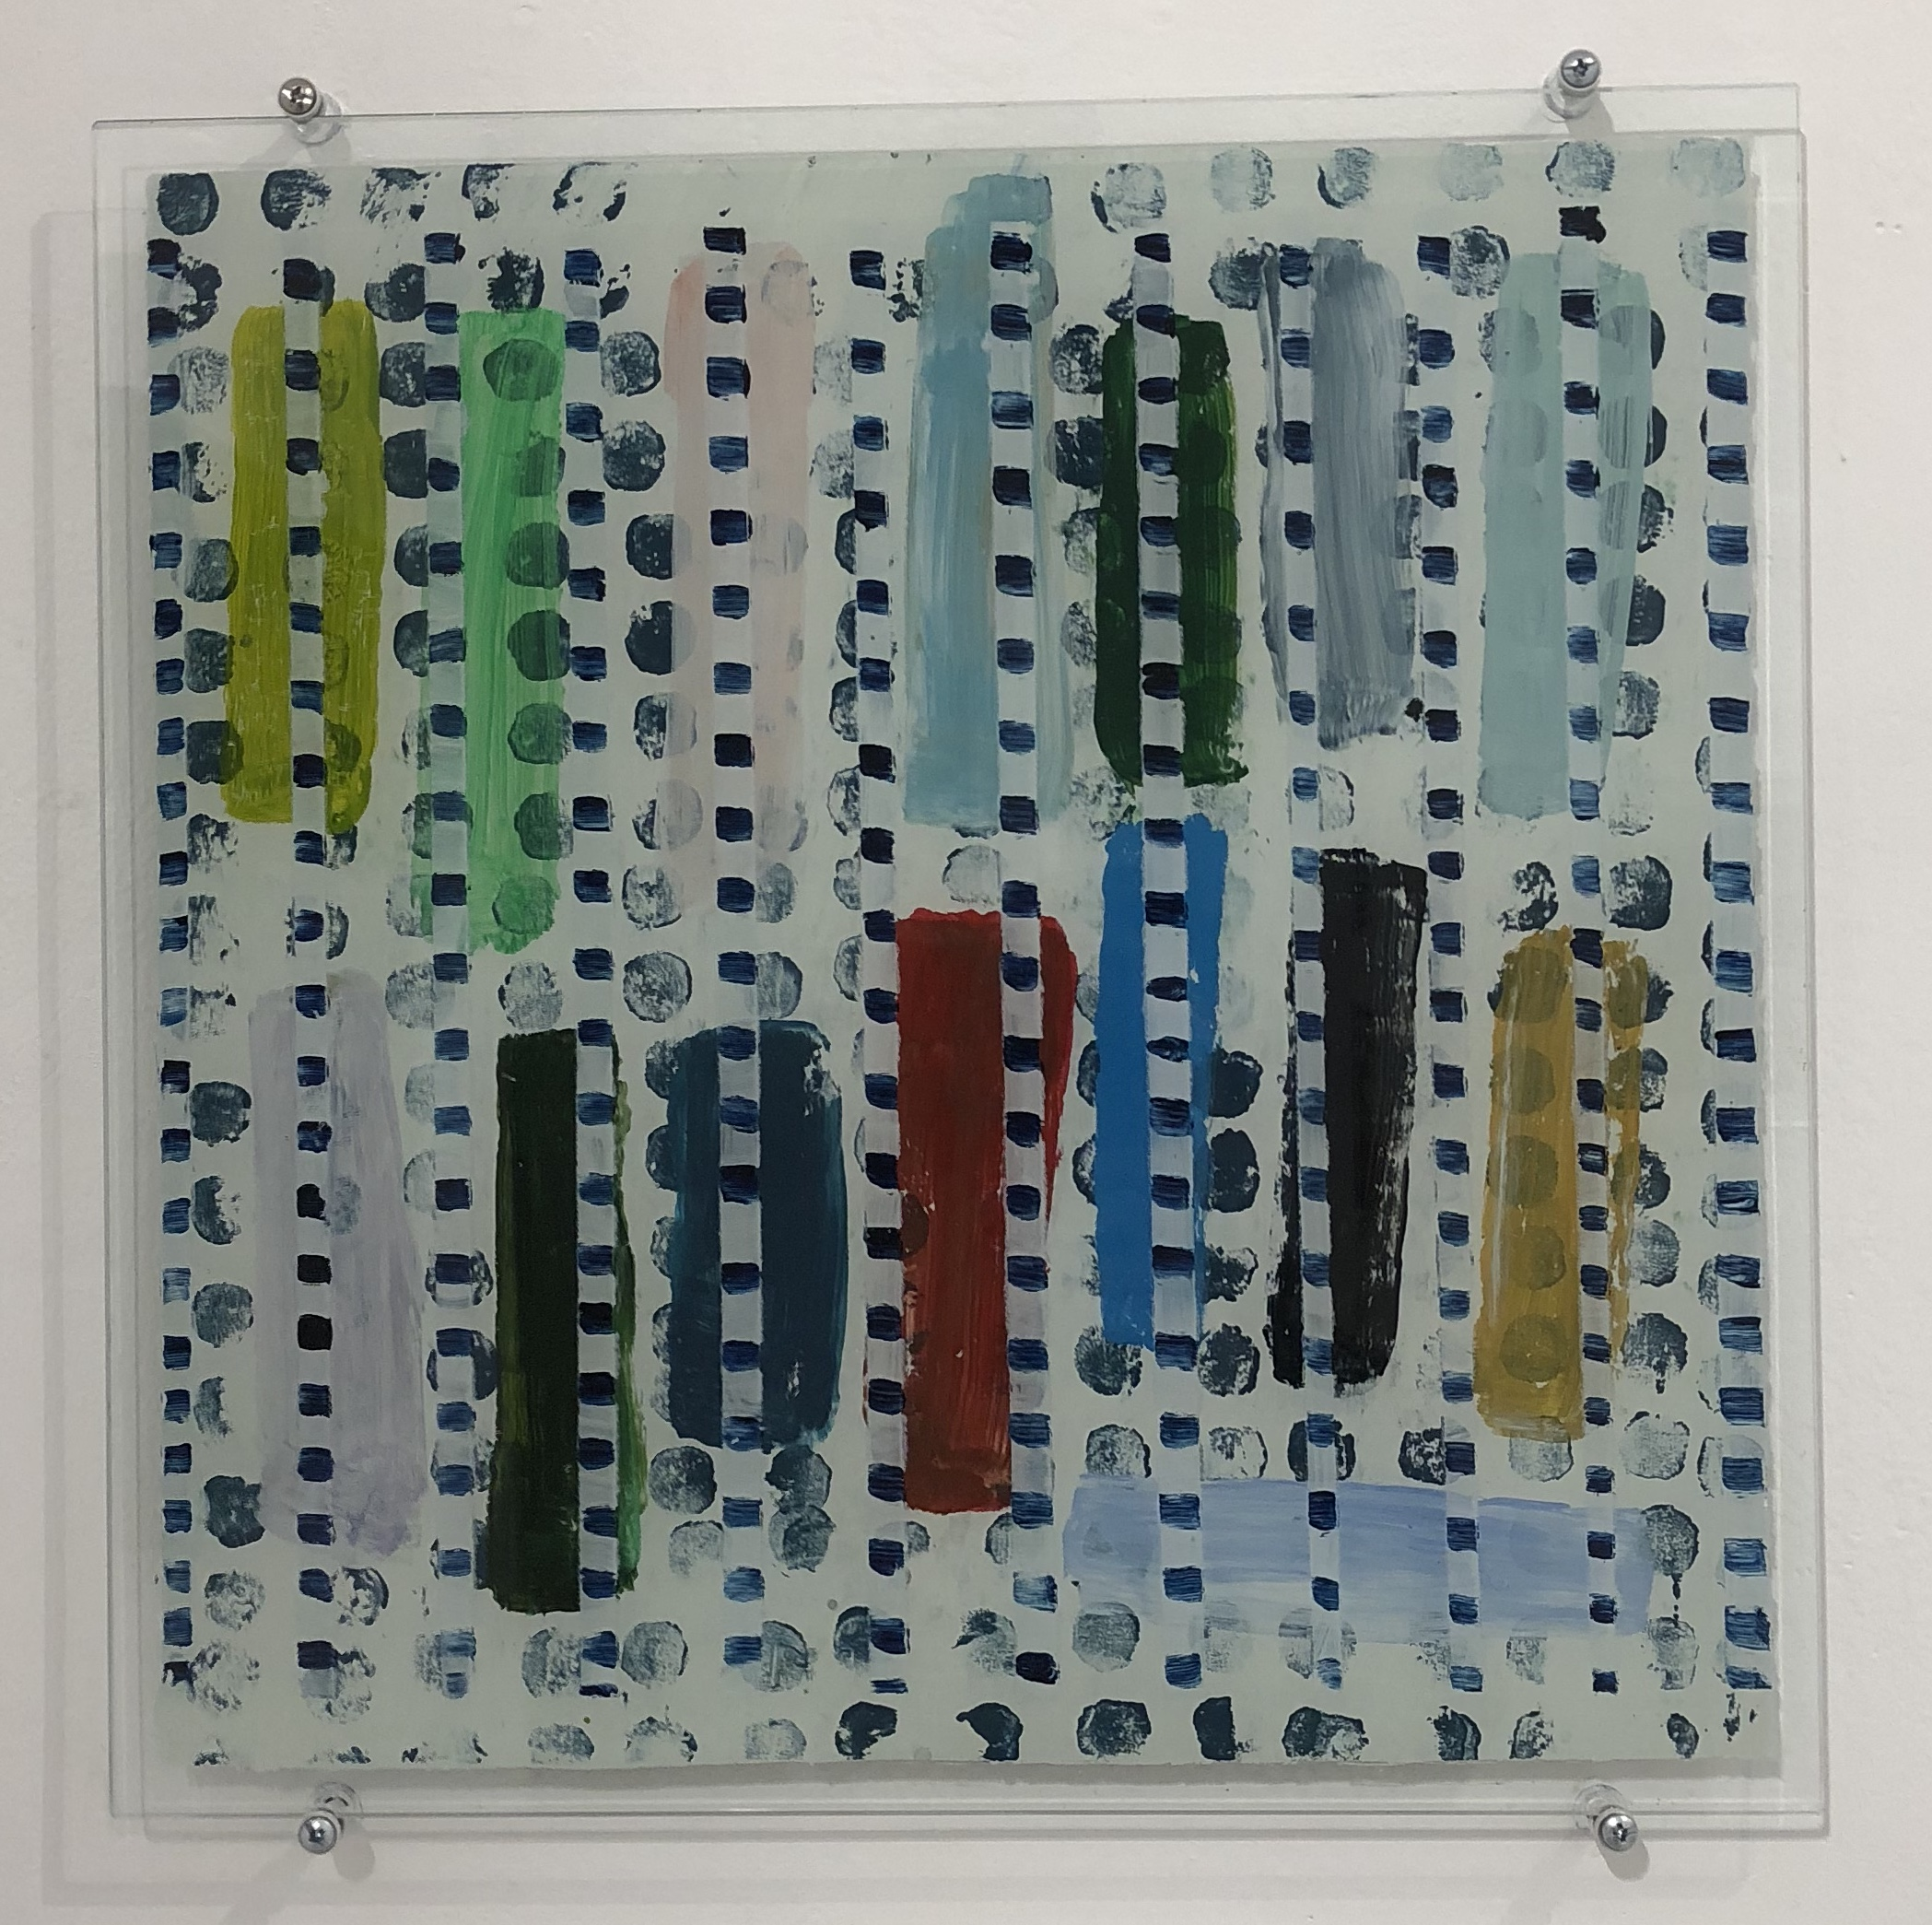 Julia Flanagan Backwards thinking 2017 acrylic on glass 40x40cm $650.00